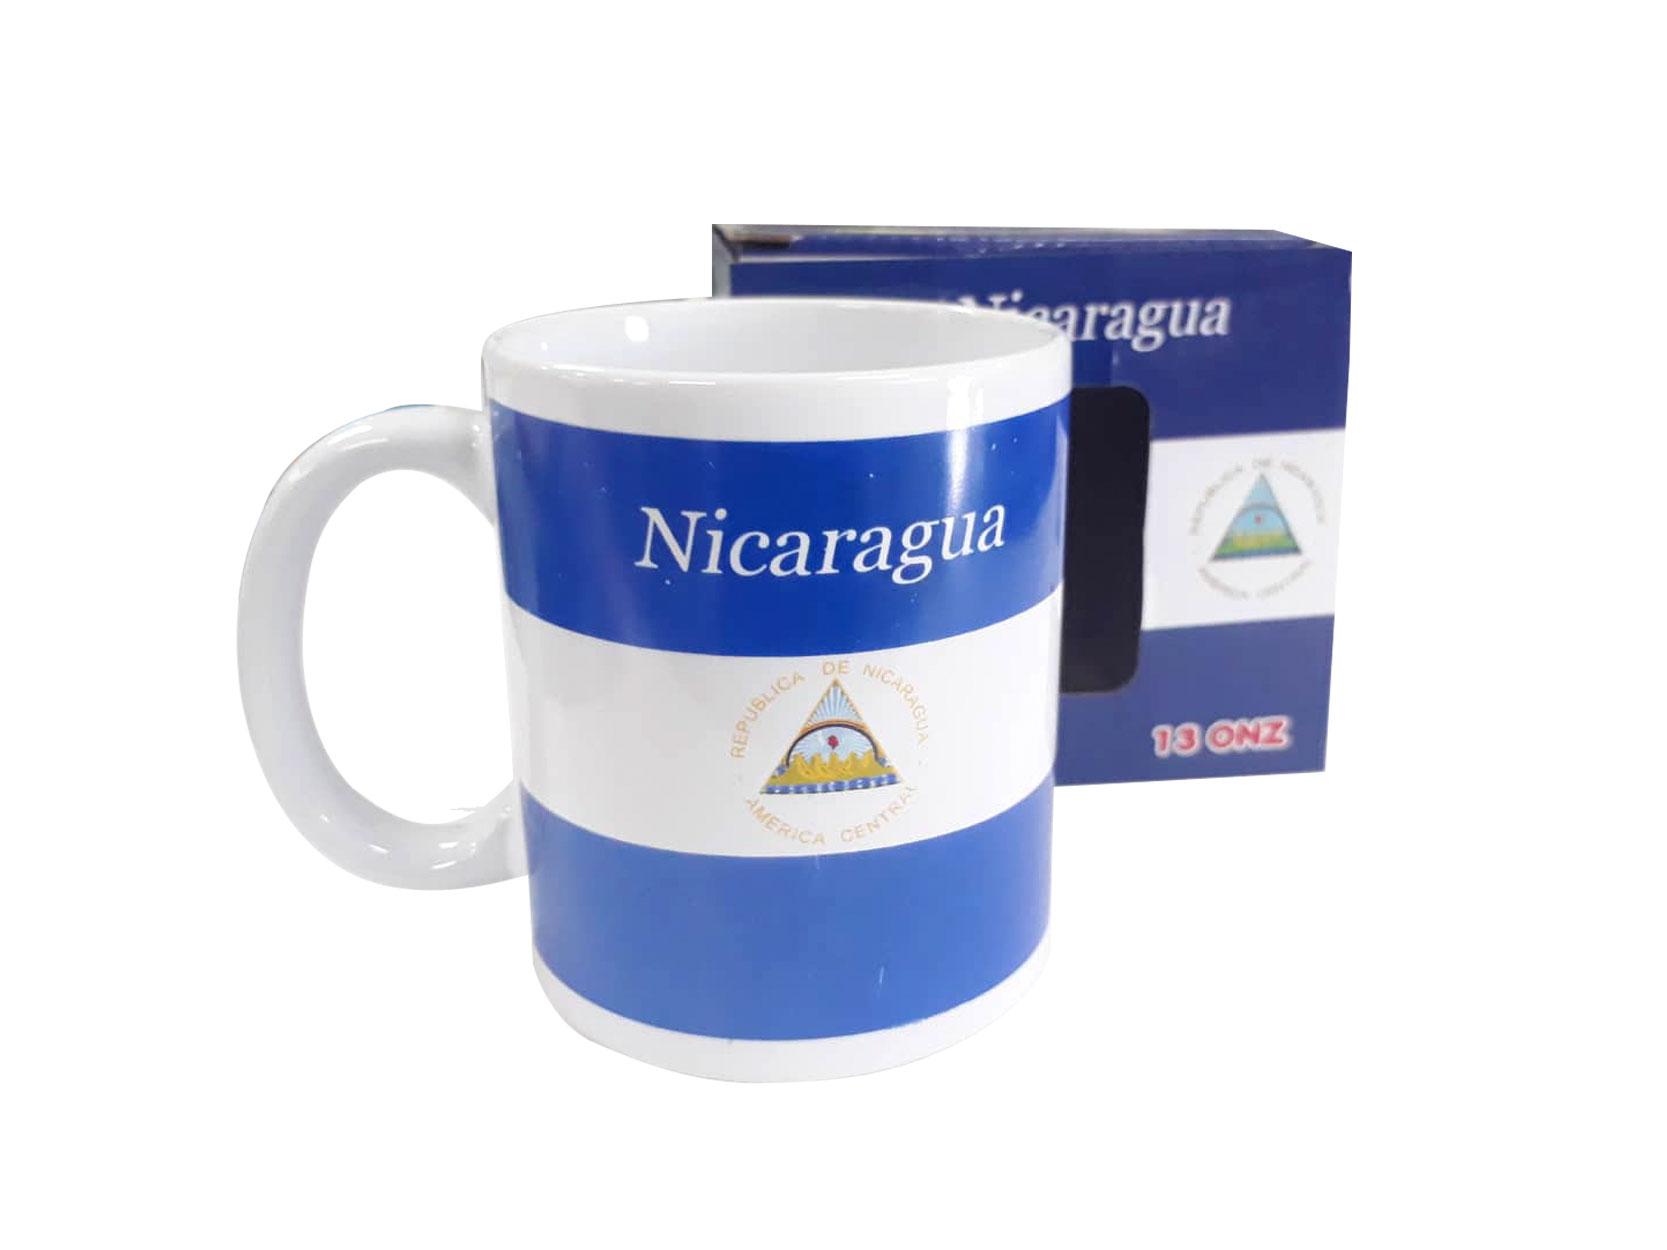 TAZA DE PORCELANA NICARAGUA H307-036